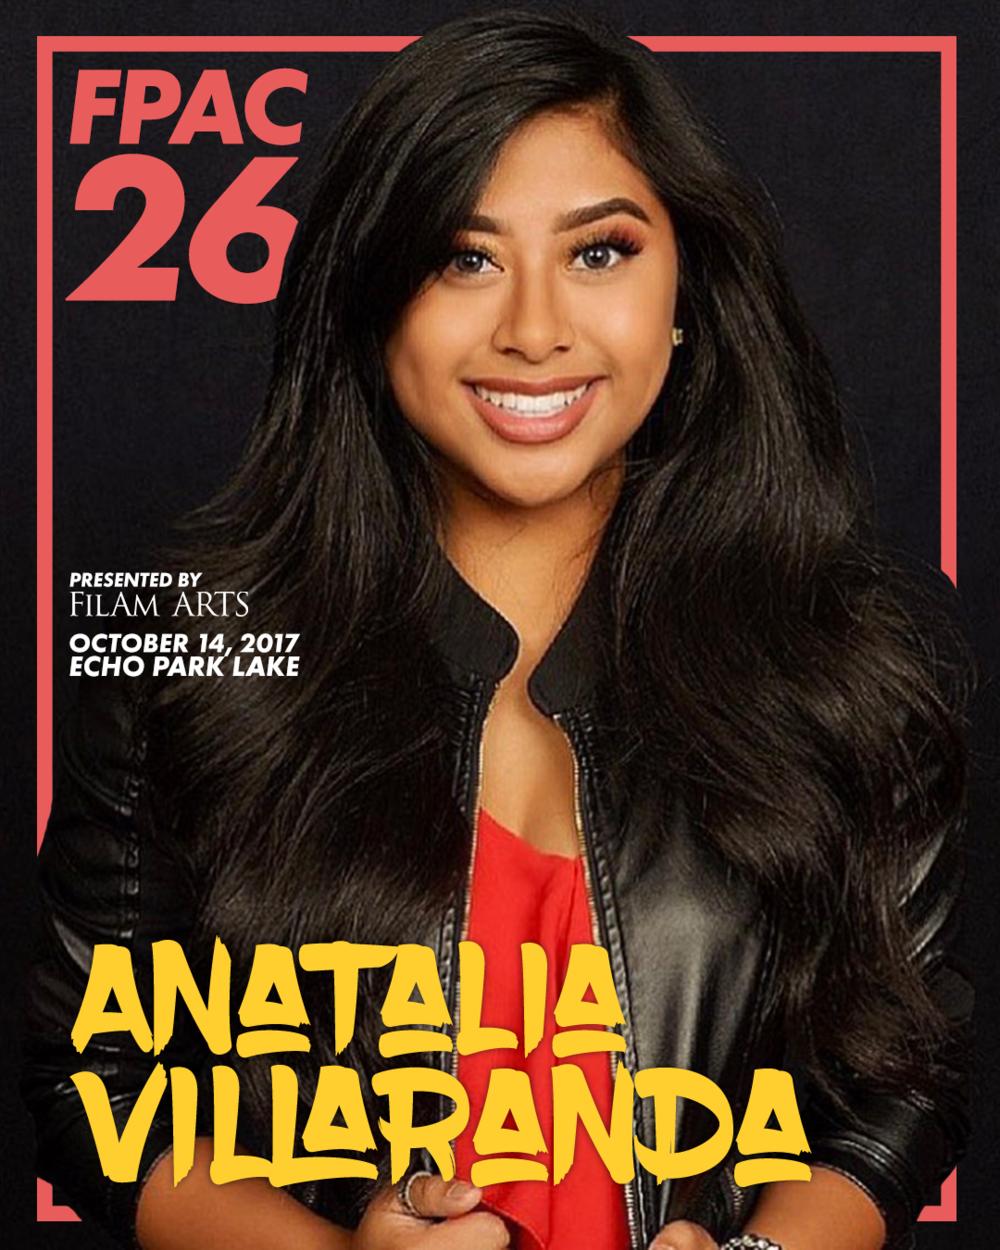 Anatalia Villaranda